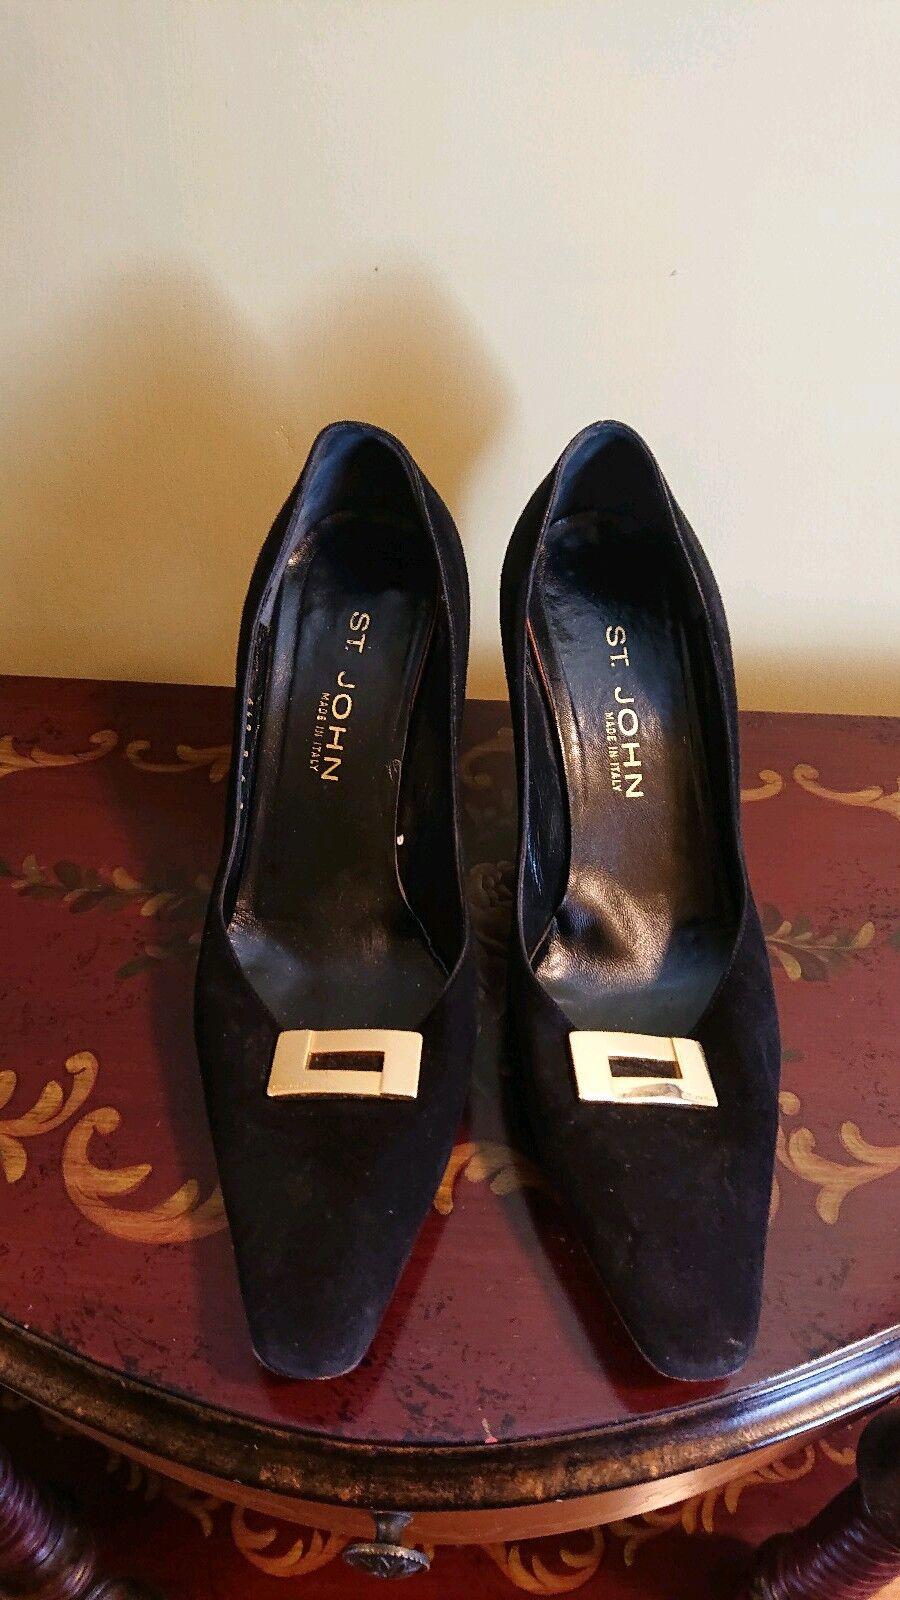 St. John Designer Femme Talons Escarpins Chaussures Noir Taille 9